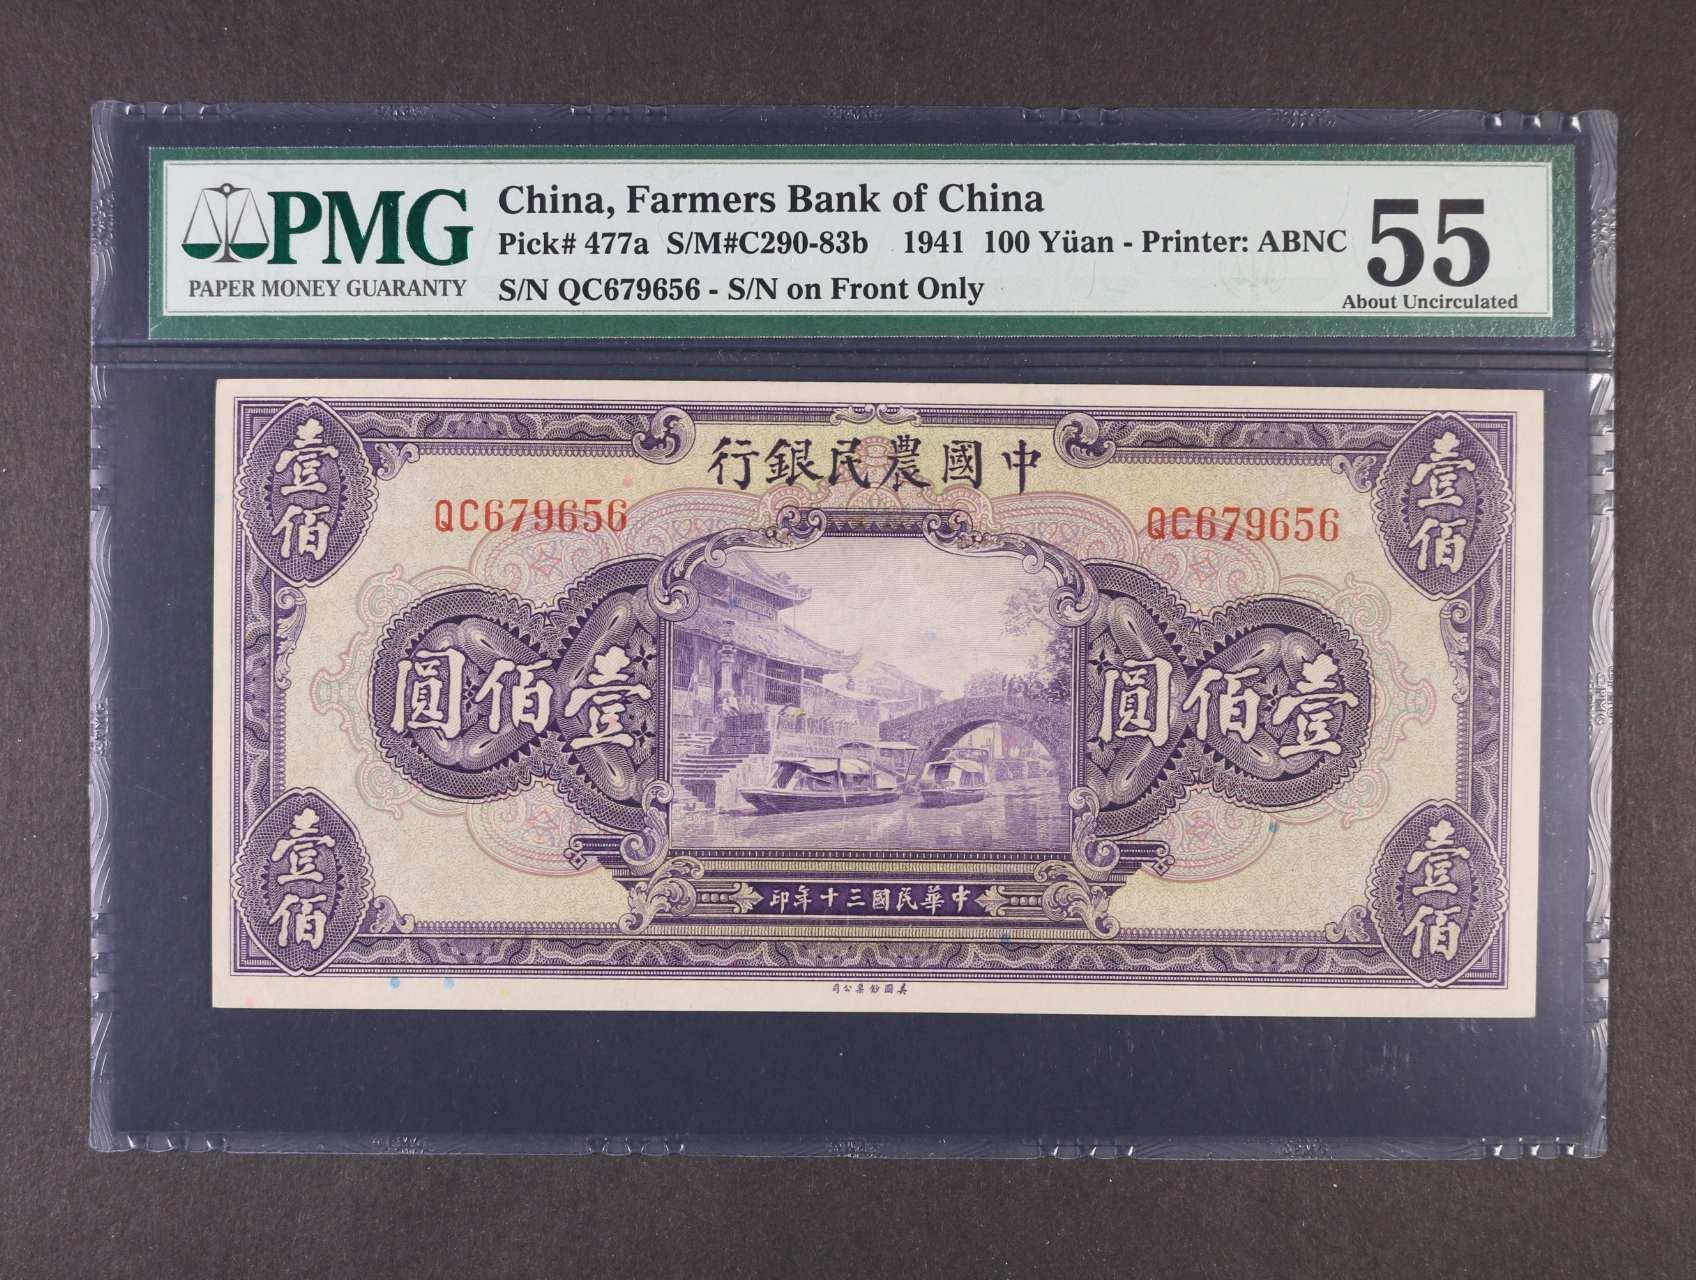 Farmers Bank of China, 100 Yüan 1941, Pi. 477a, PMG 55